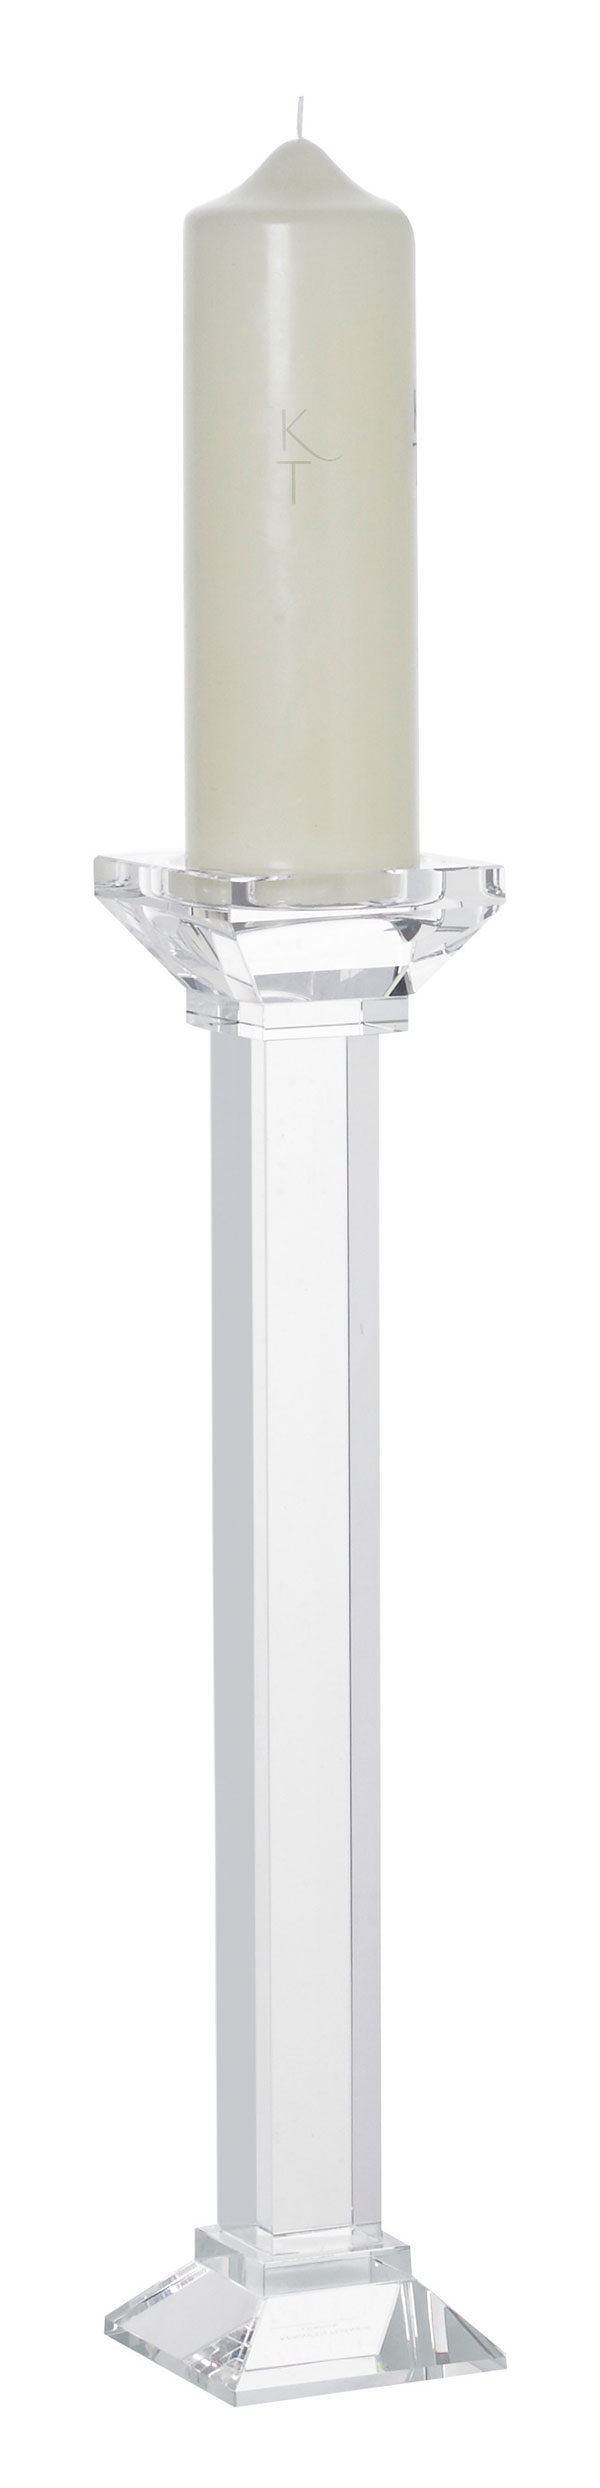 Roman Column - Large-0